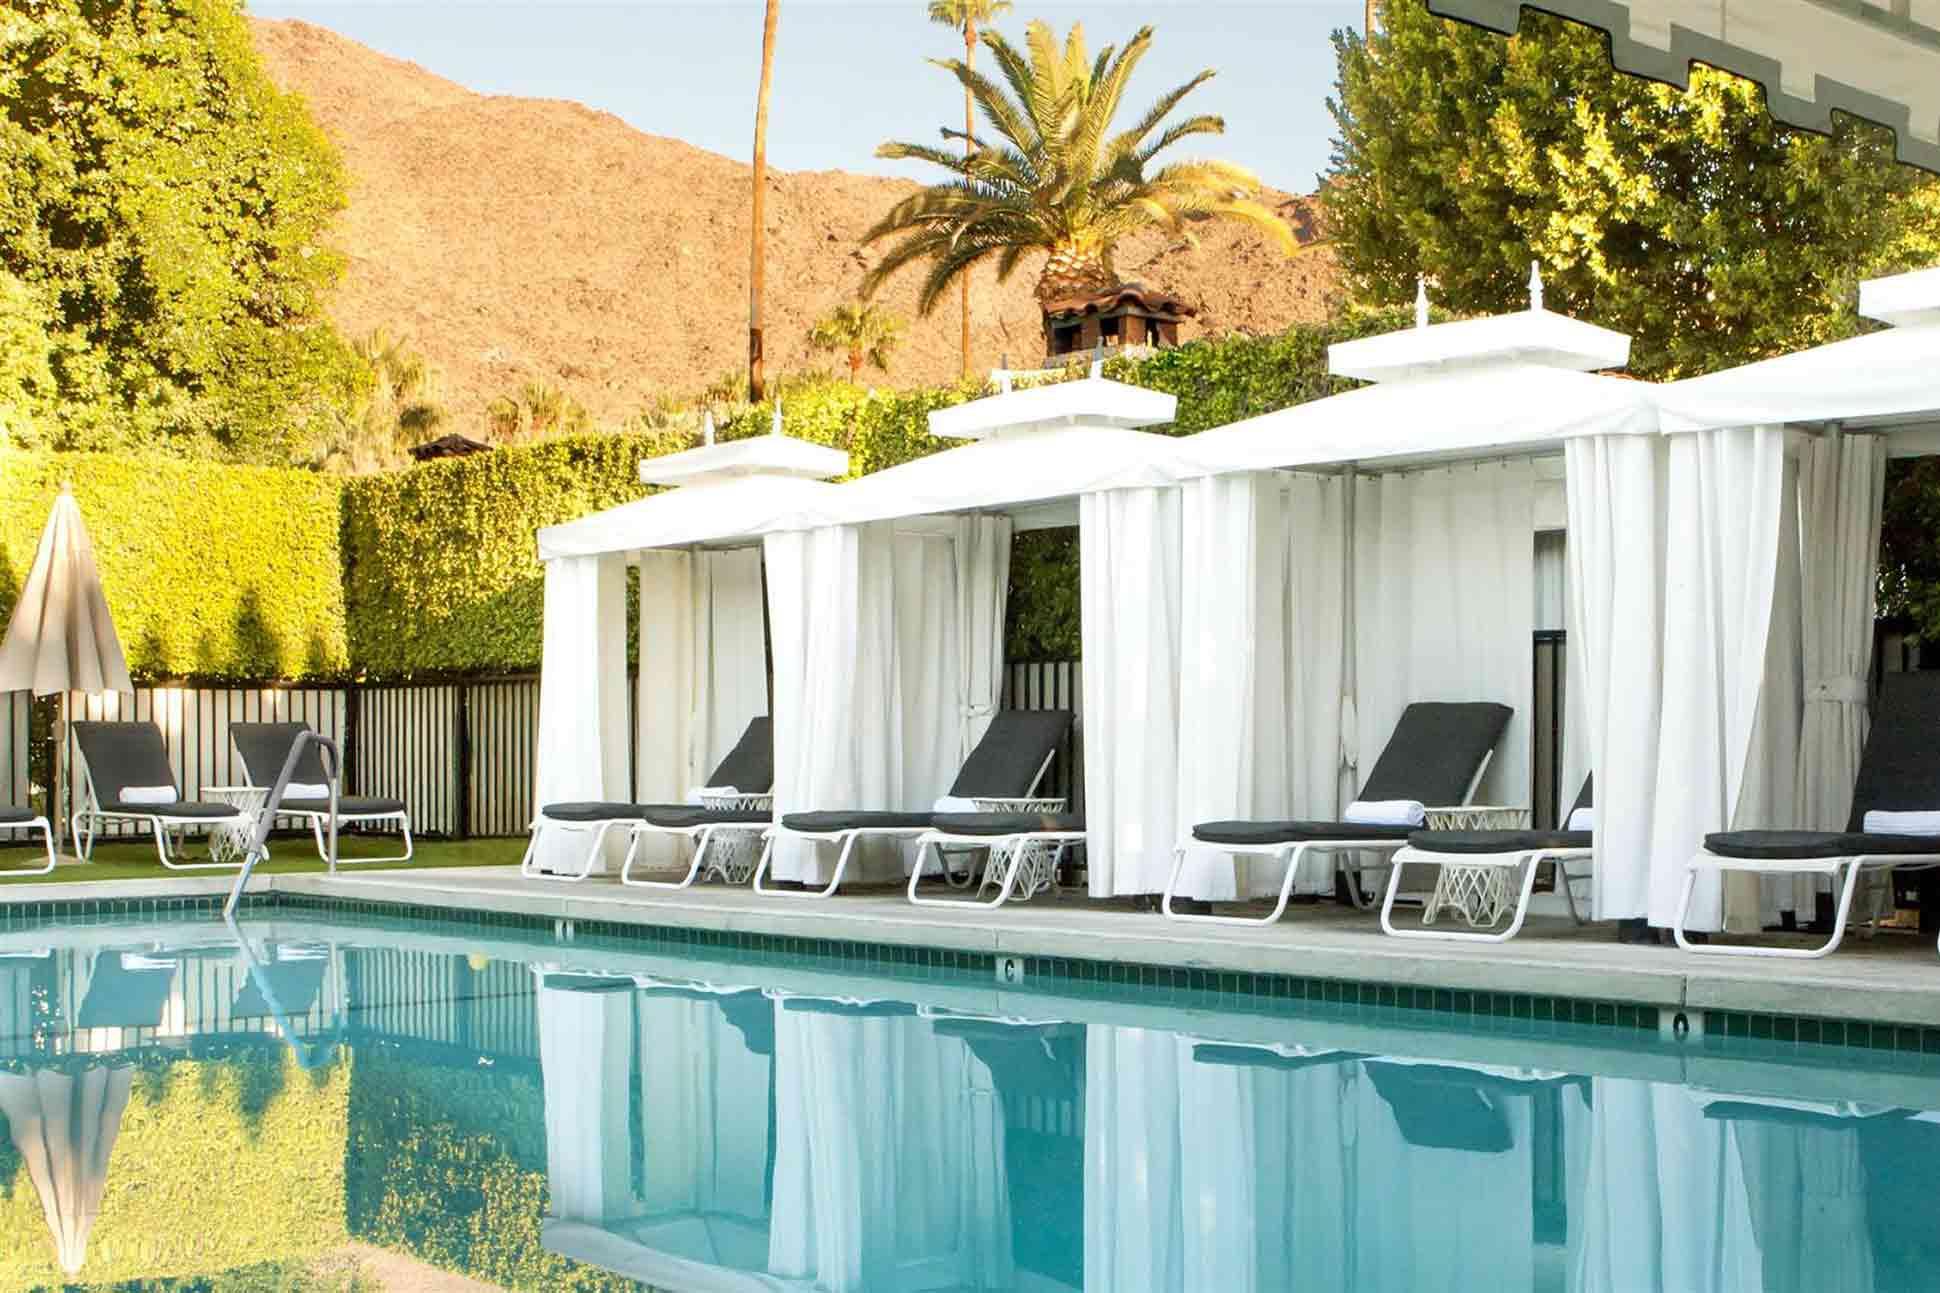 Avalon Hotel & Bungalows <br> Palm Springs, California, USA